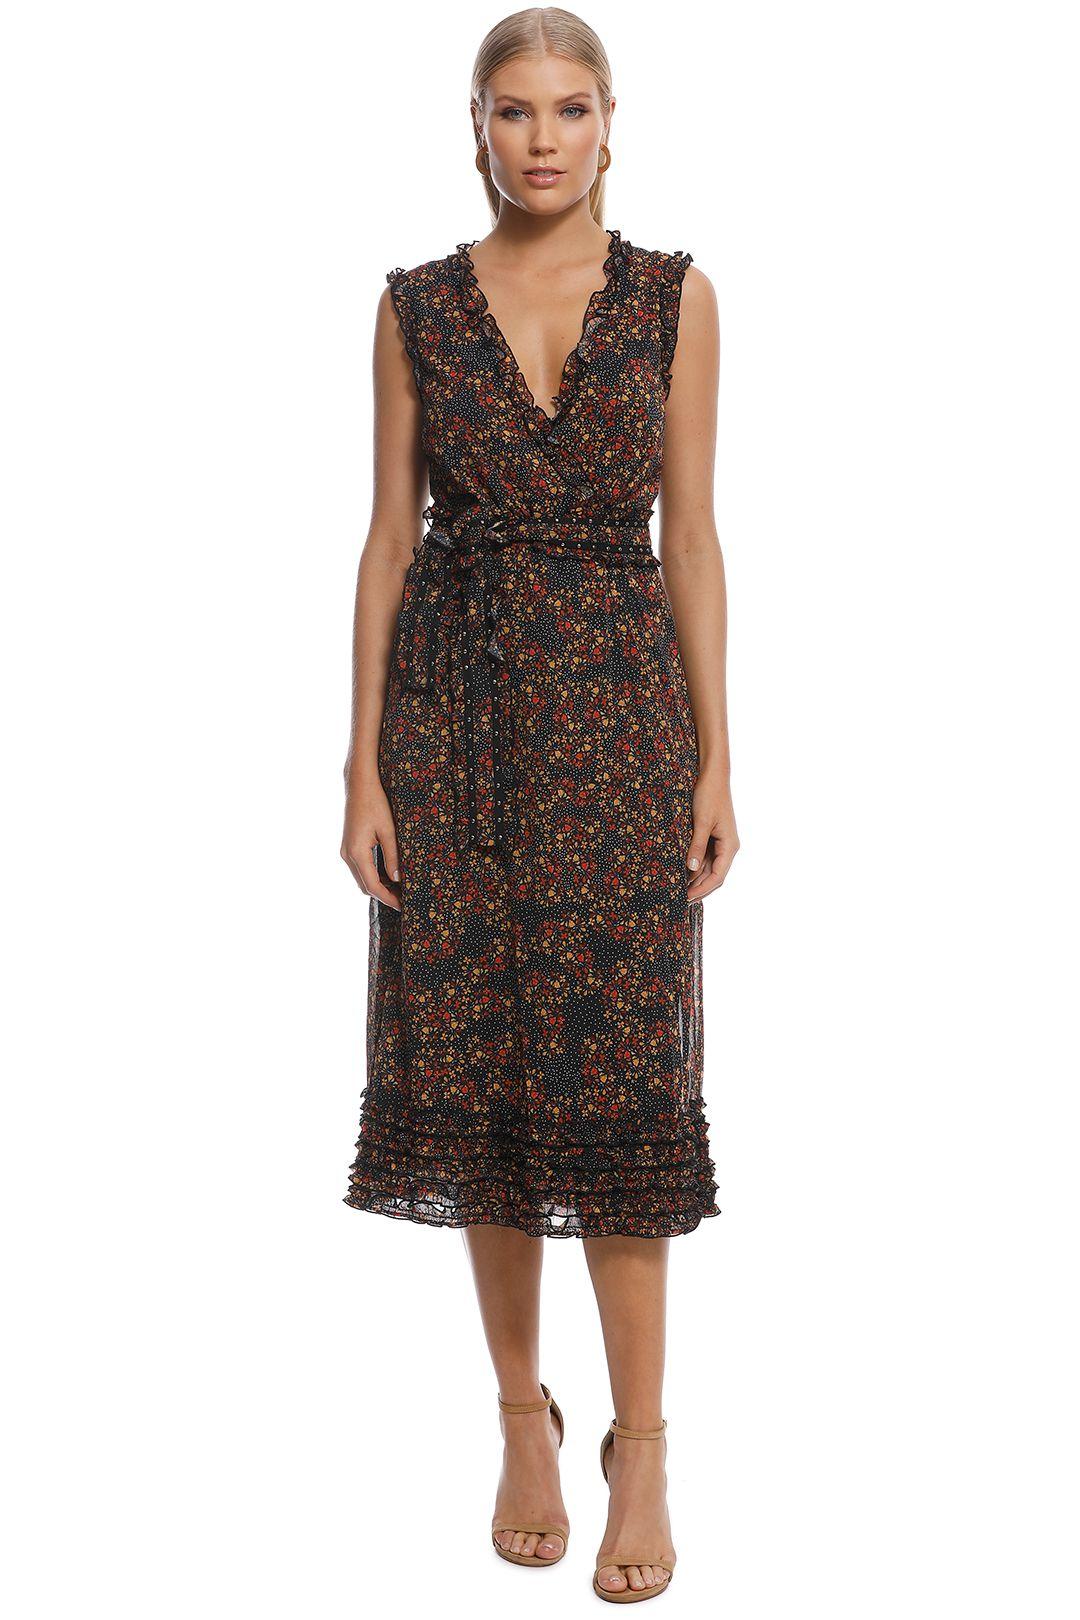 Stevie May - Monarch Midi Dress - Print - Front